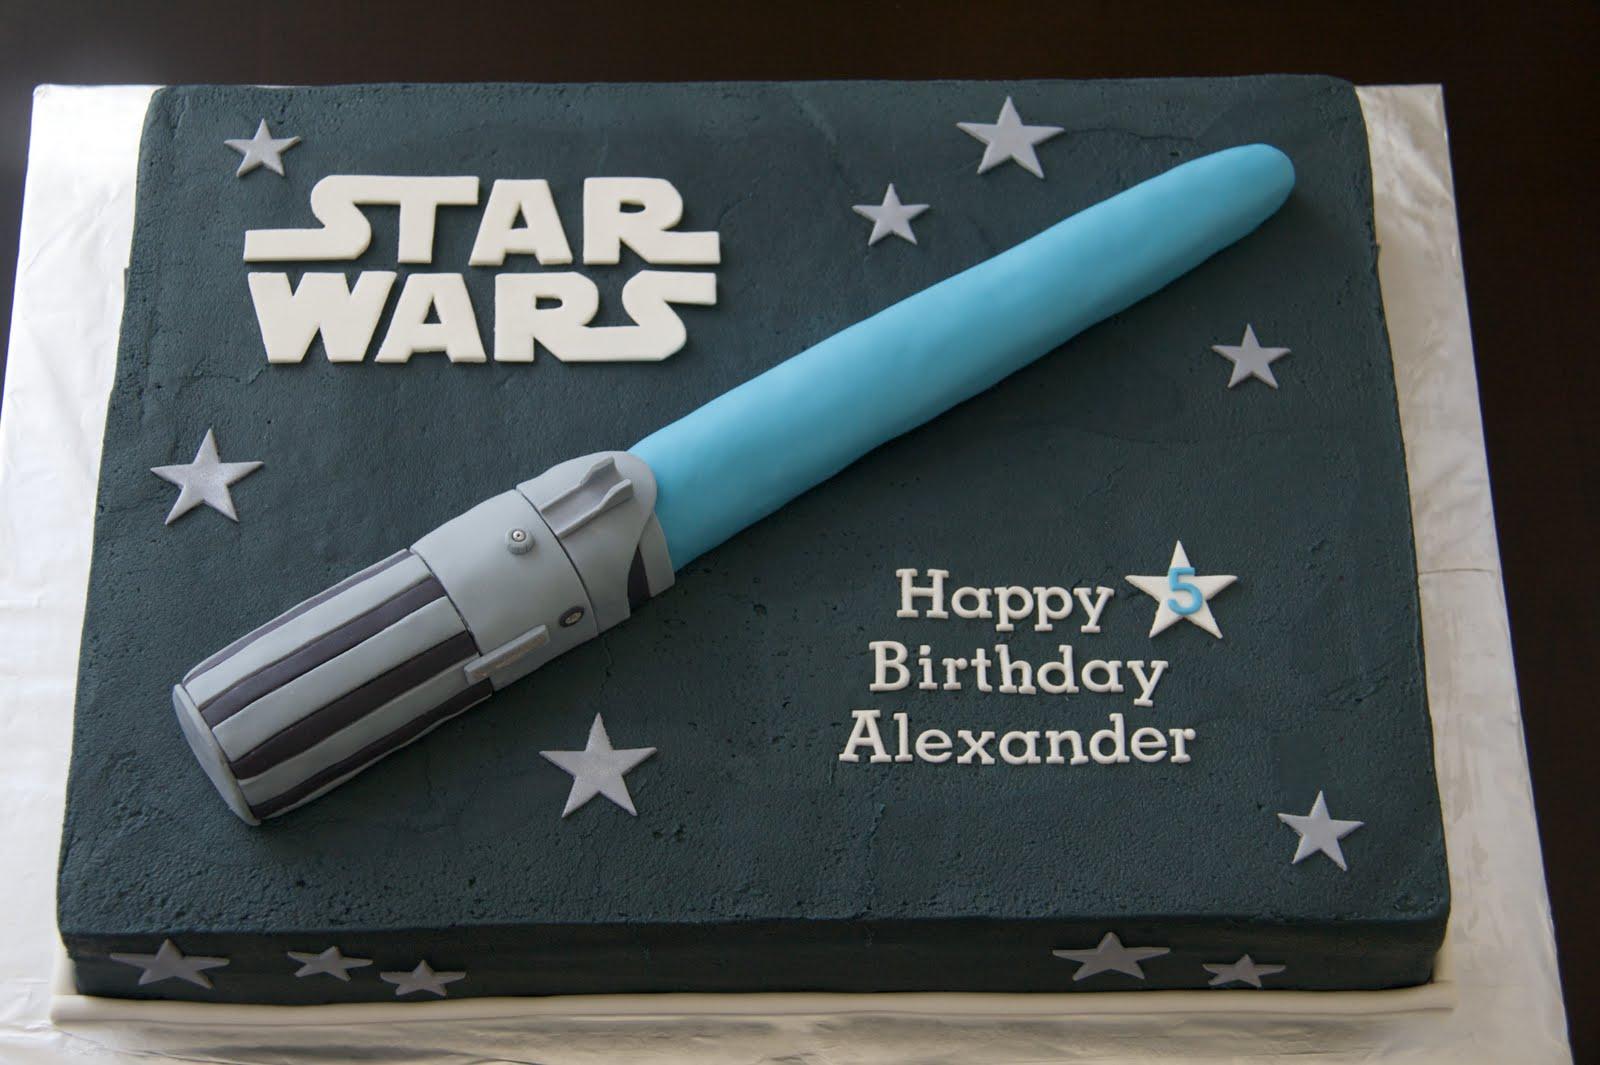 Pleasing 11 Easy Lightsaber Cakes Photo Star Wars Lightsaber Cake Funny Birthday Cards Online Sheoxdamsfinfo